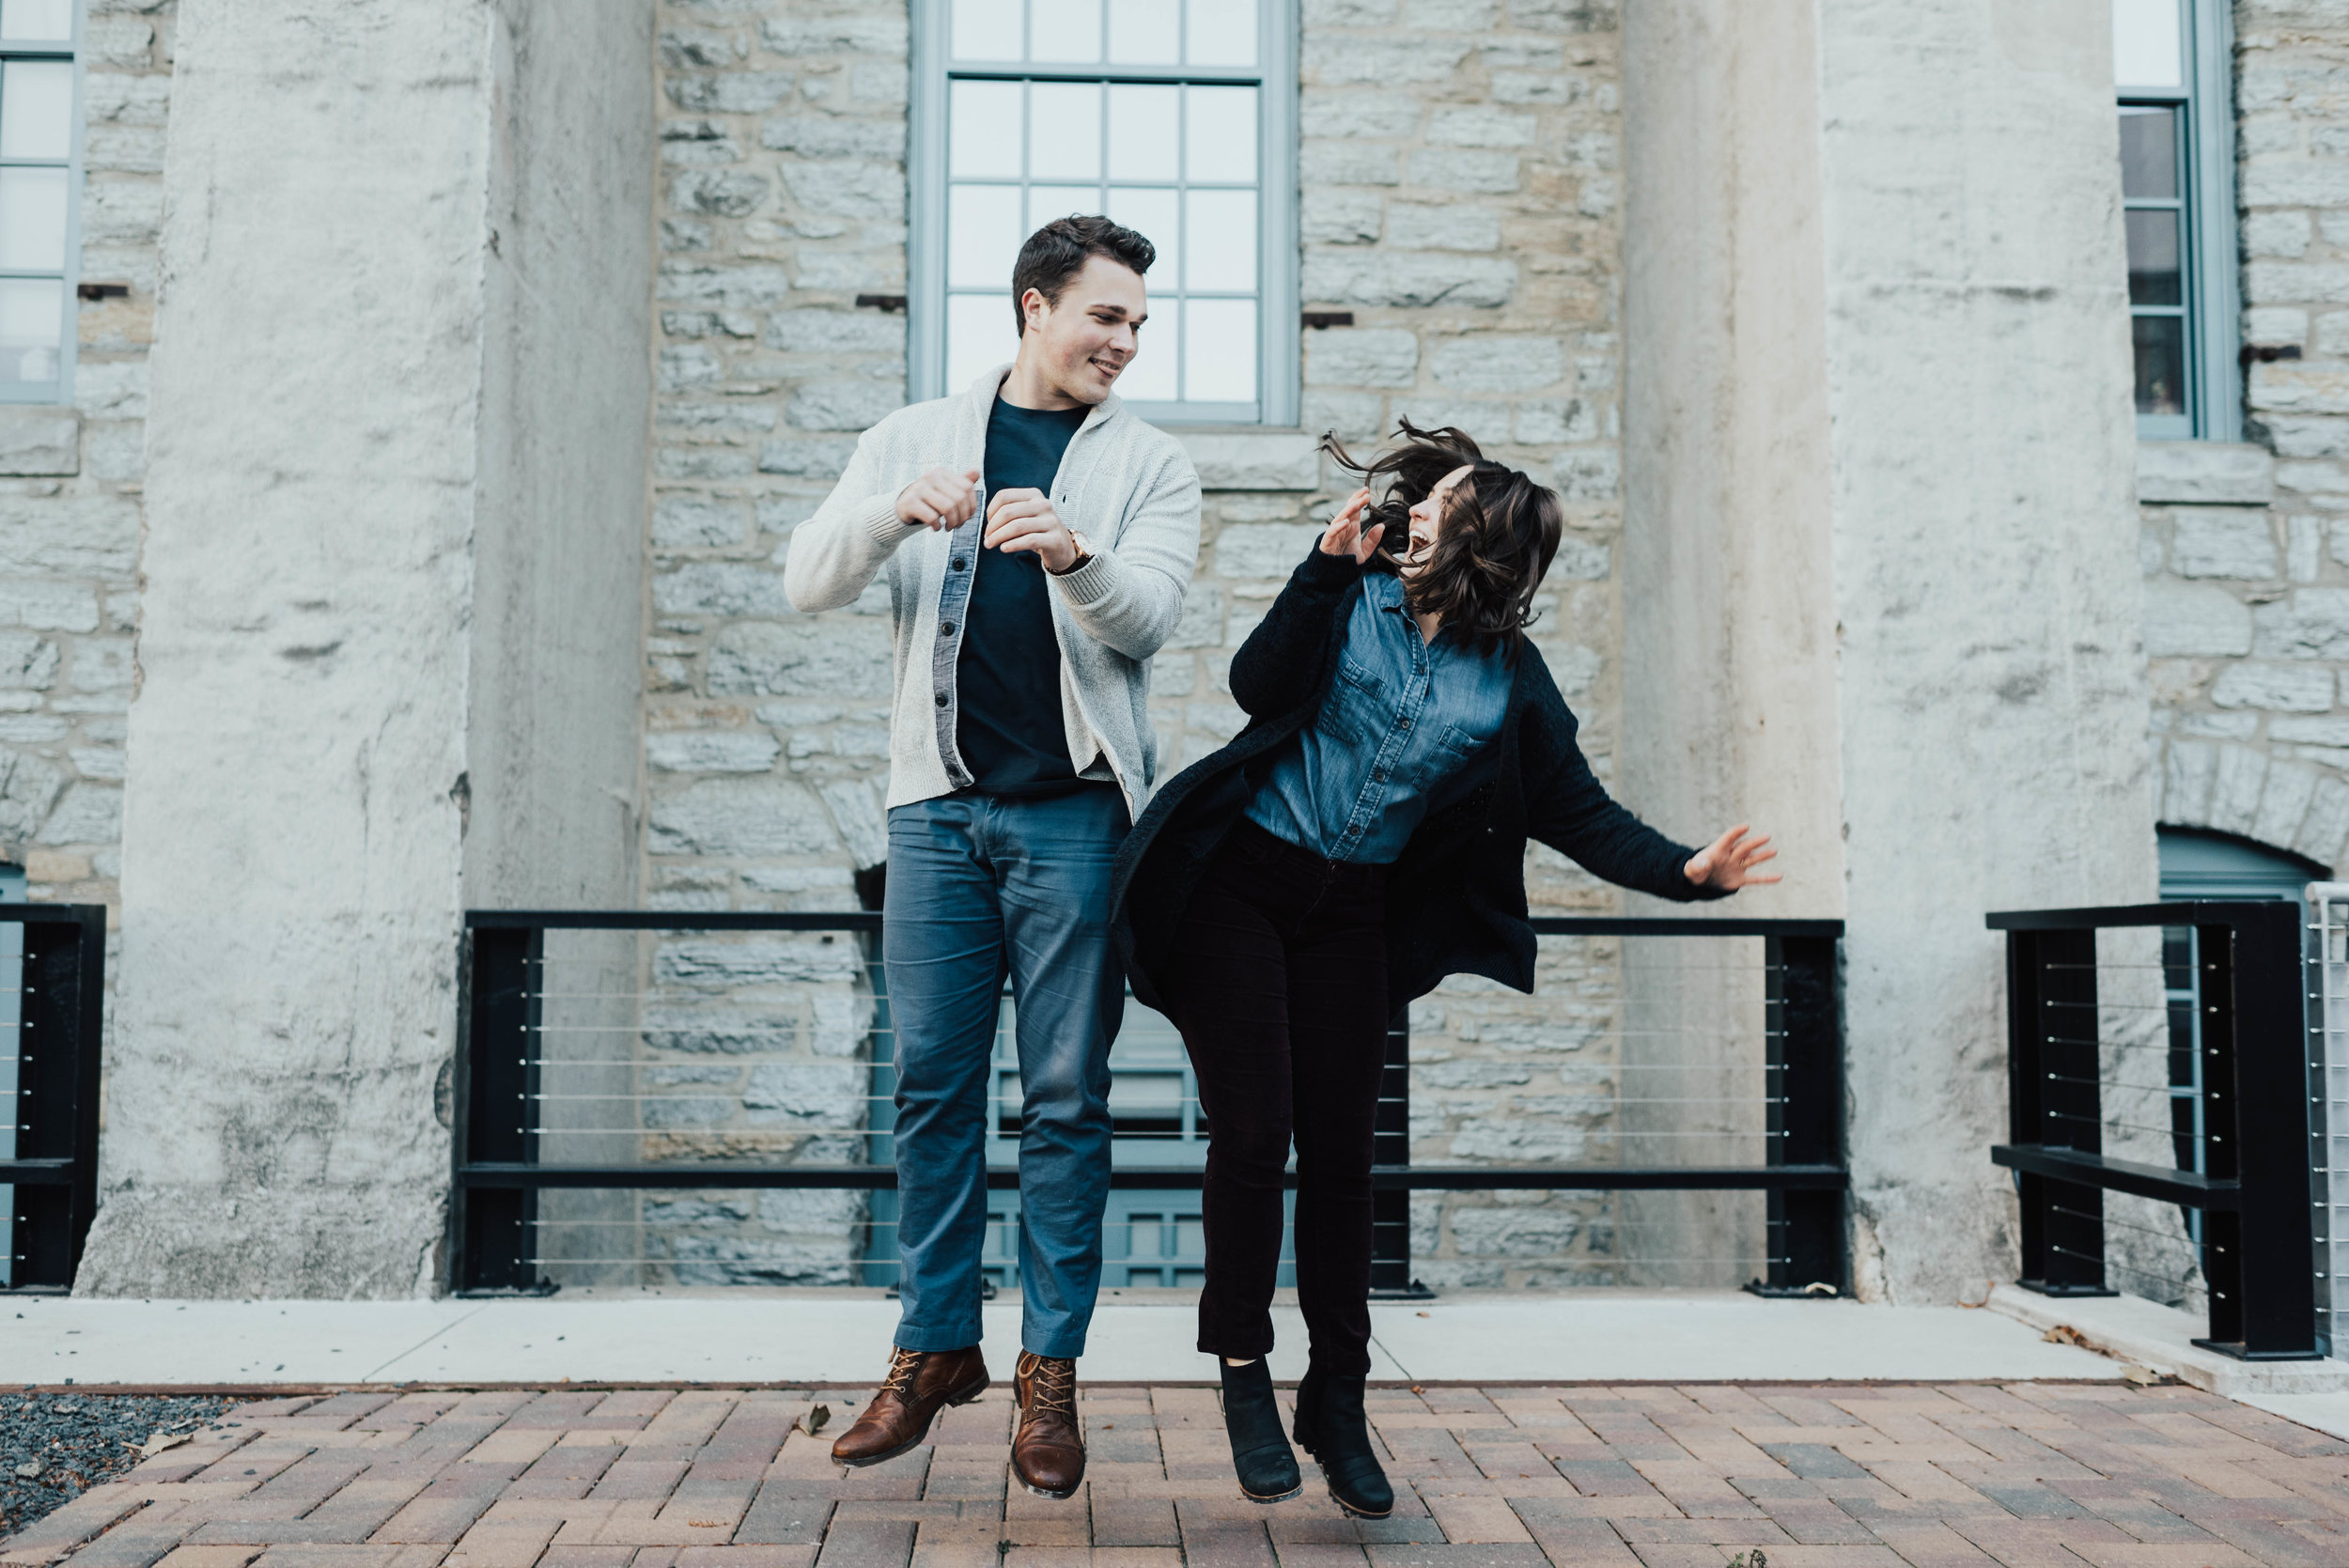 Steena-Anne-Photography-Samantha-Josh-Minneapolis-Winter-Engagement136.jpg